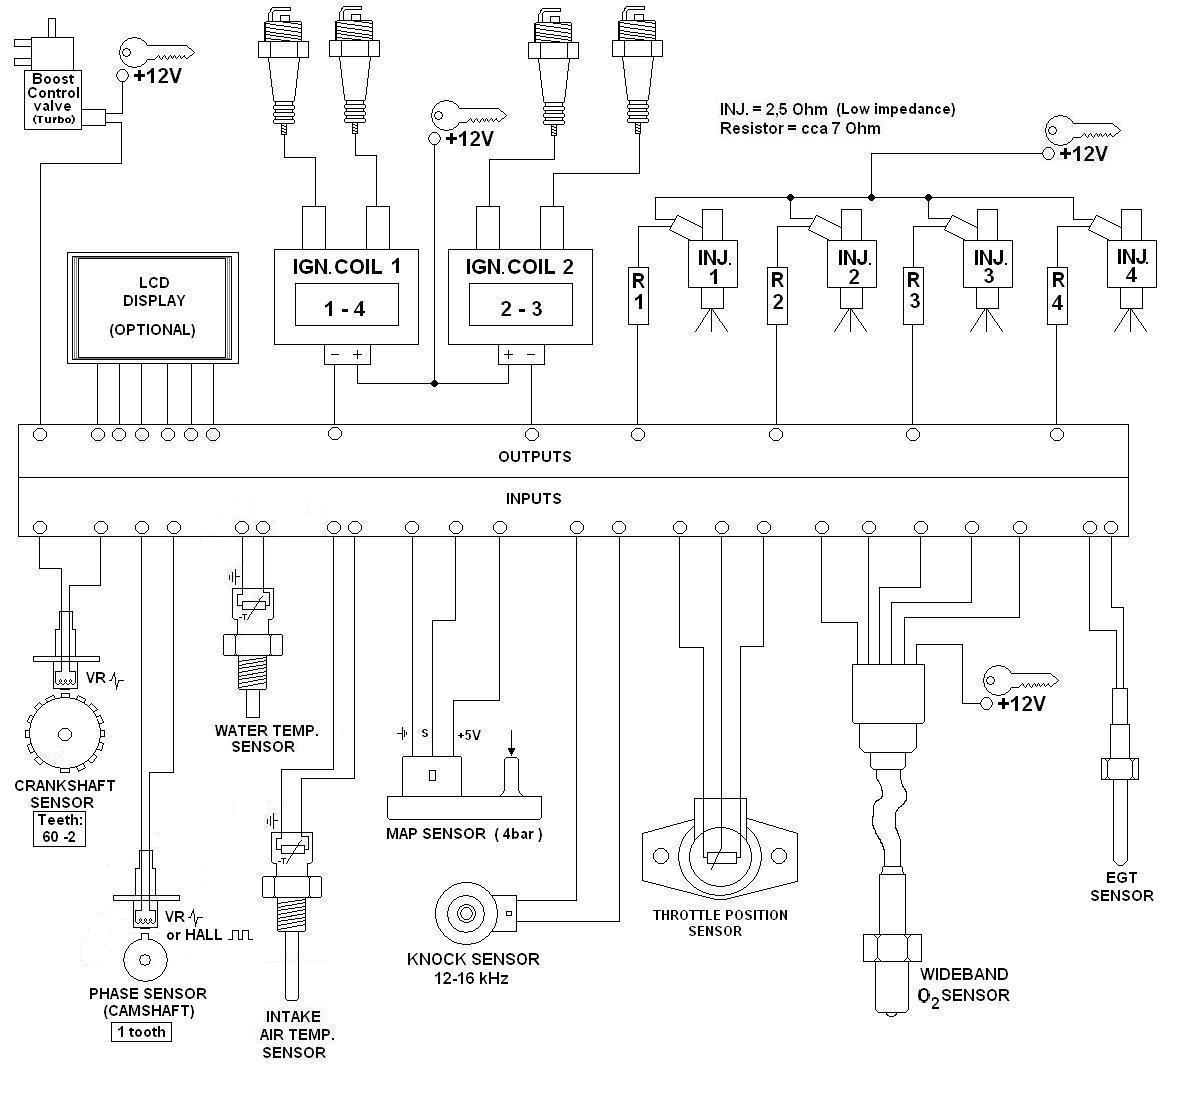 Fiat 130 wiring diagram